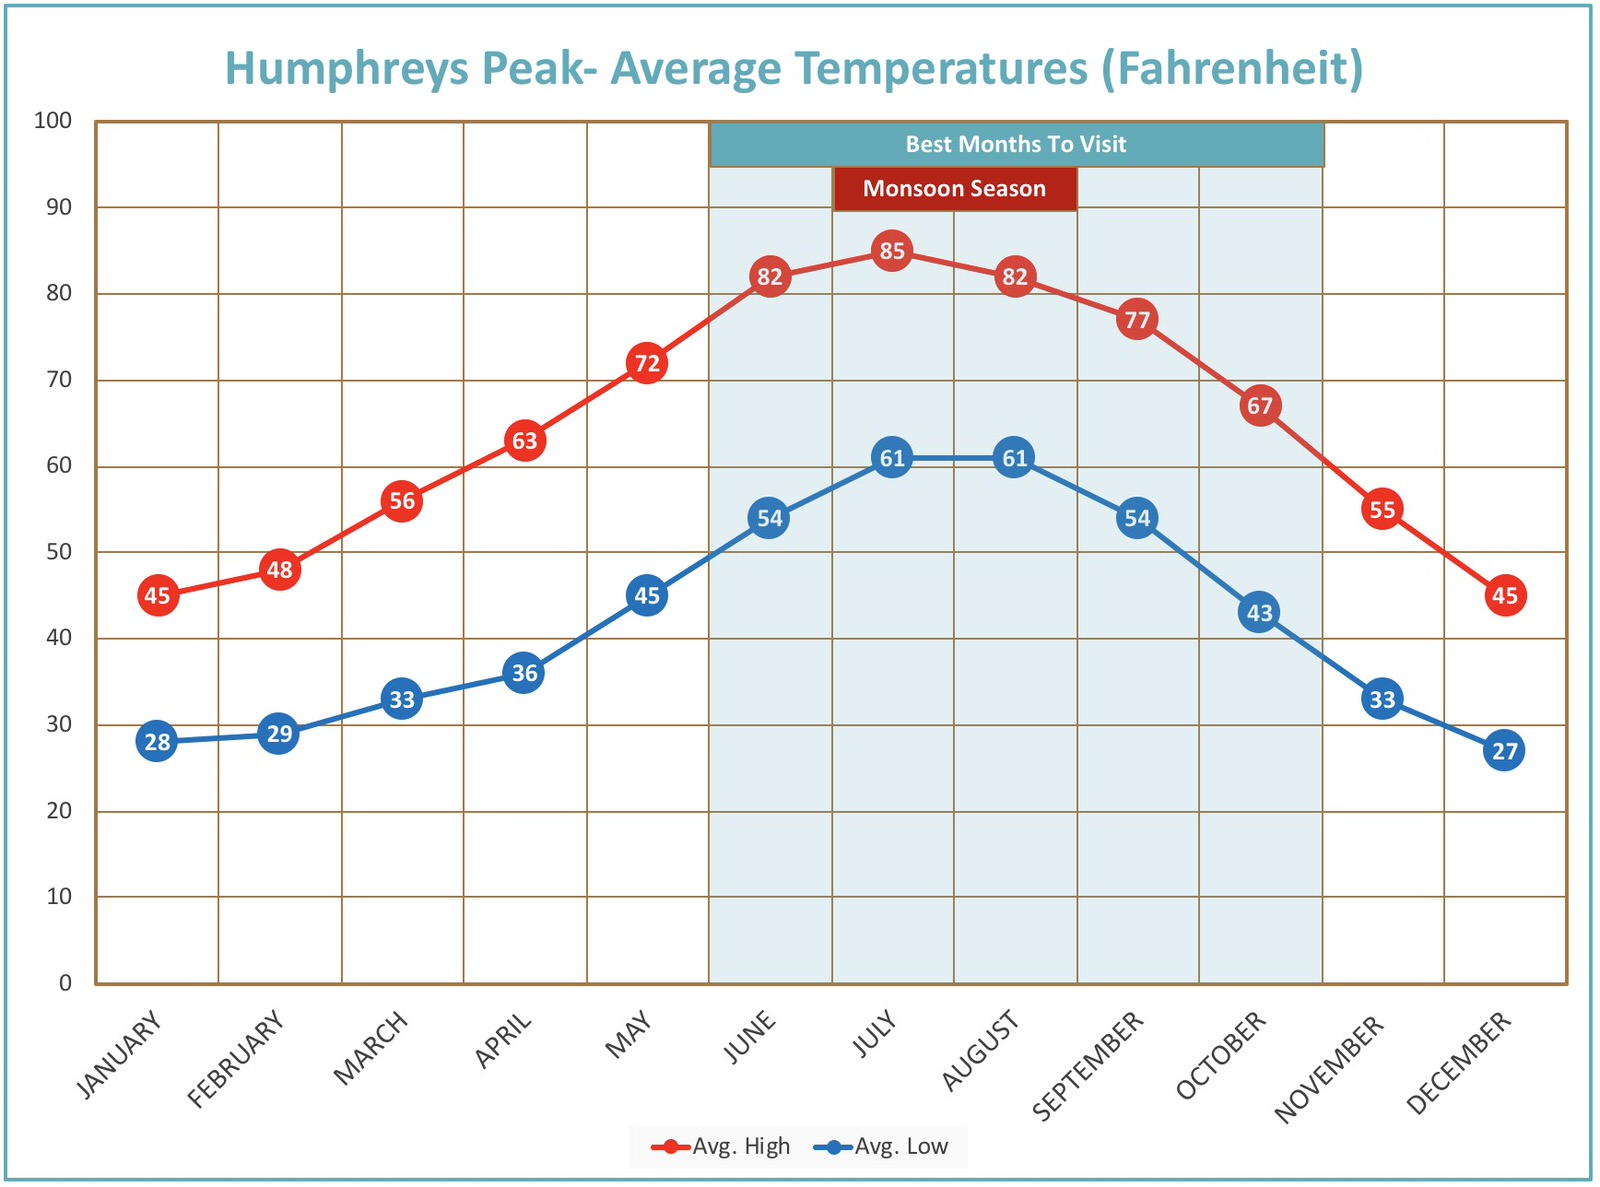 temperature-plot-humphreys-peak